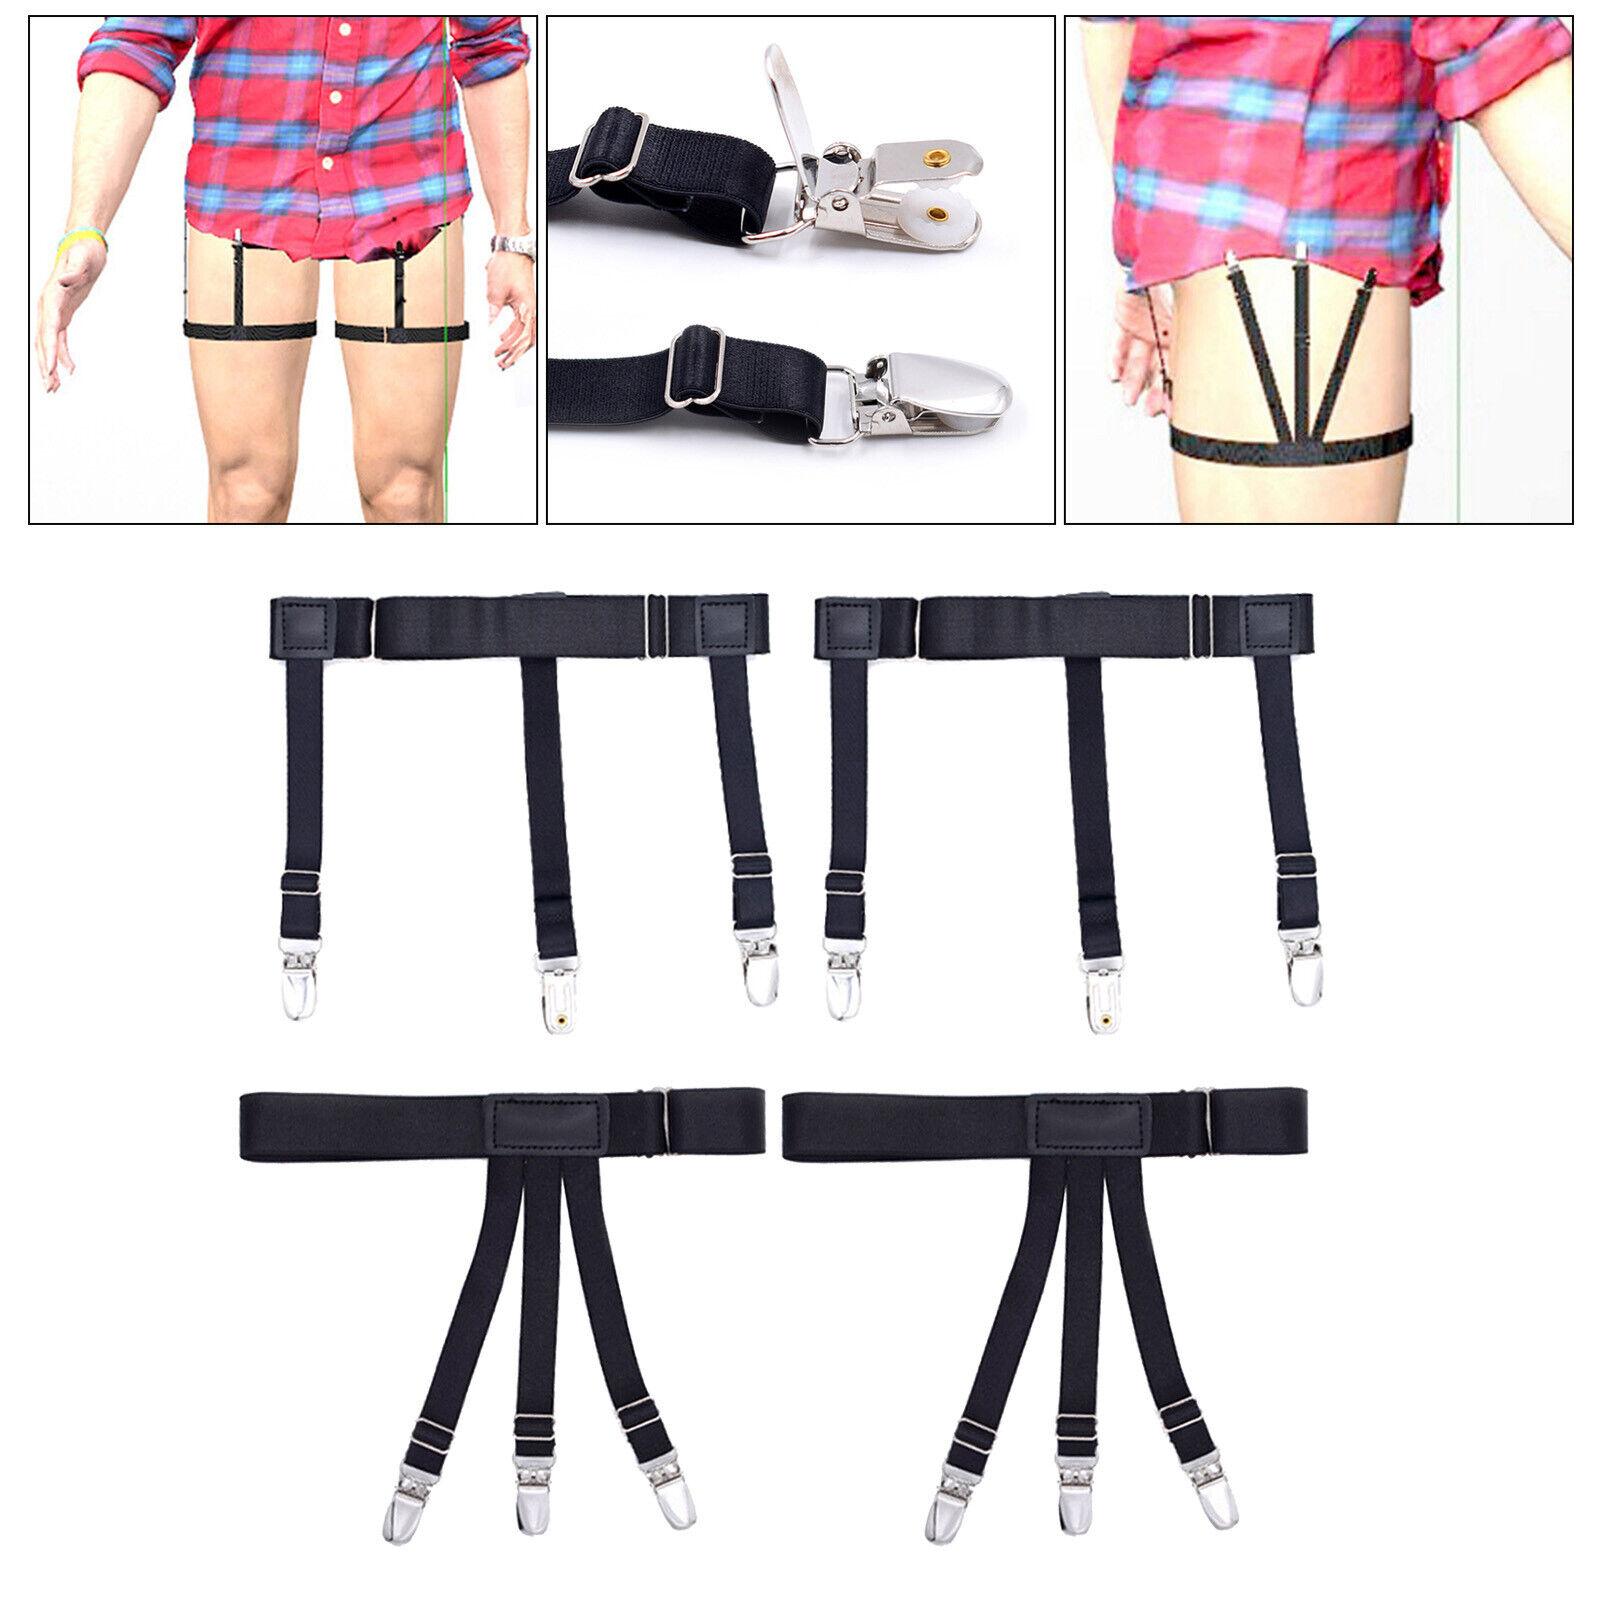 2Pcs Shirt Stays Premium Shirt Holders with Non Slip Locking Clamps Elasticity